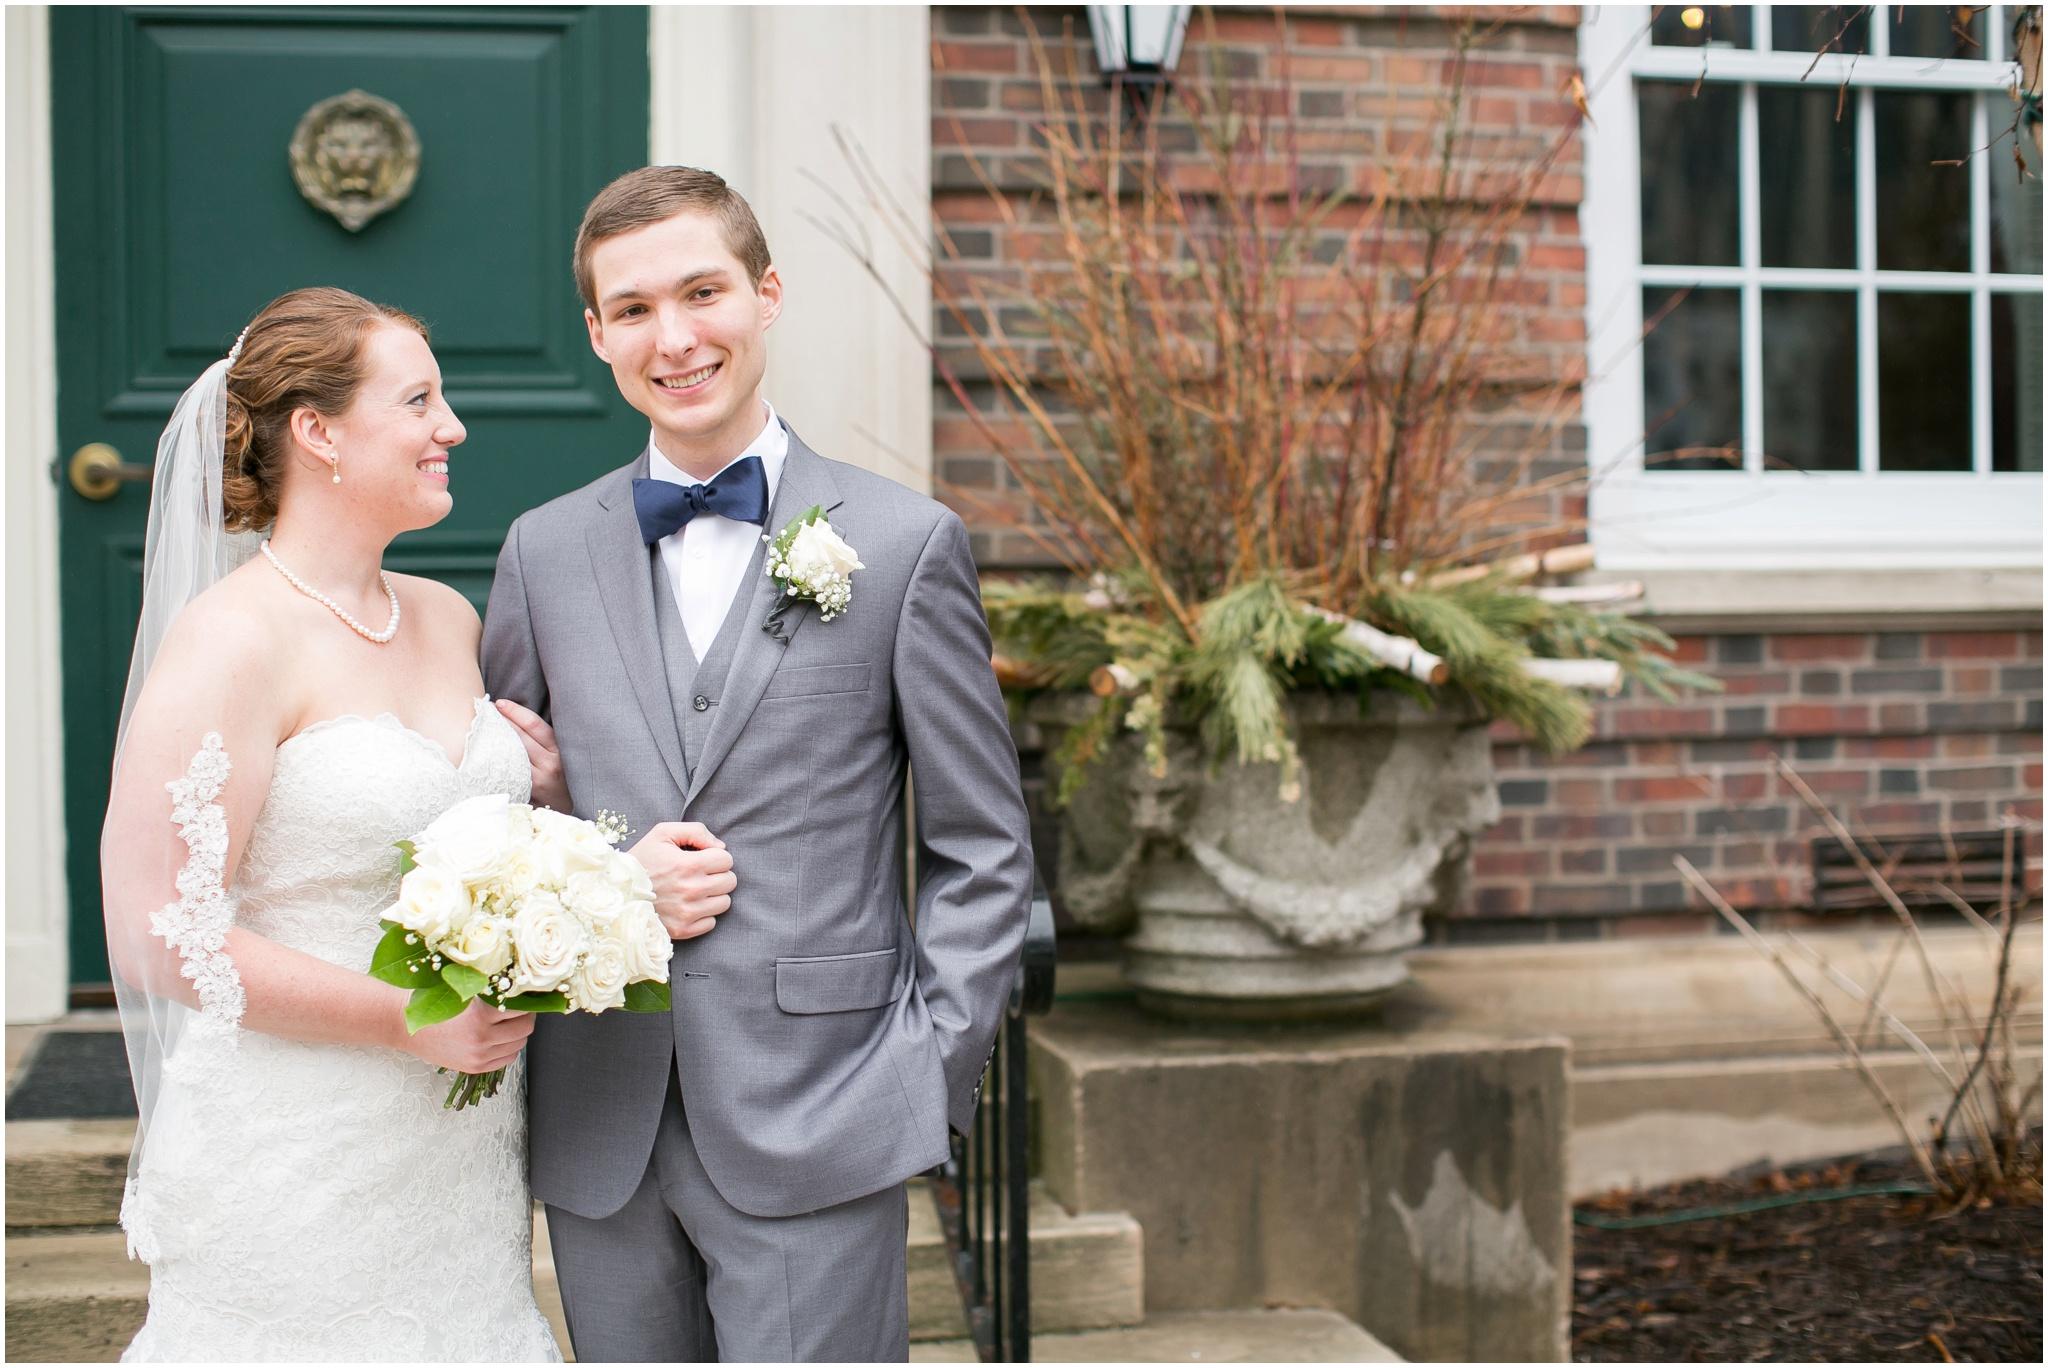 Madison_Club_Madison_Wisconsin_Wedding_Photographer_Spring_Rainy_Wedding_2624.jpg